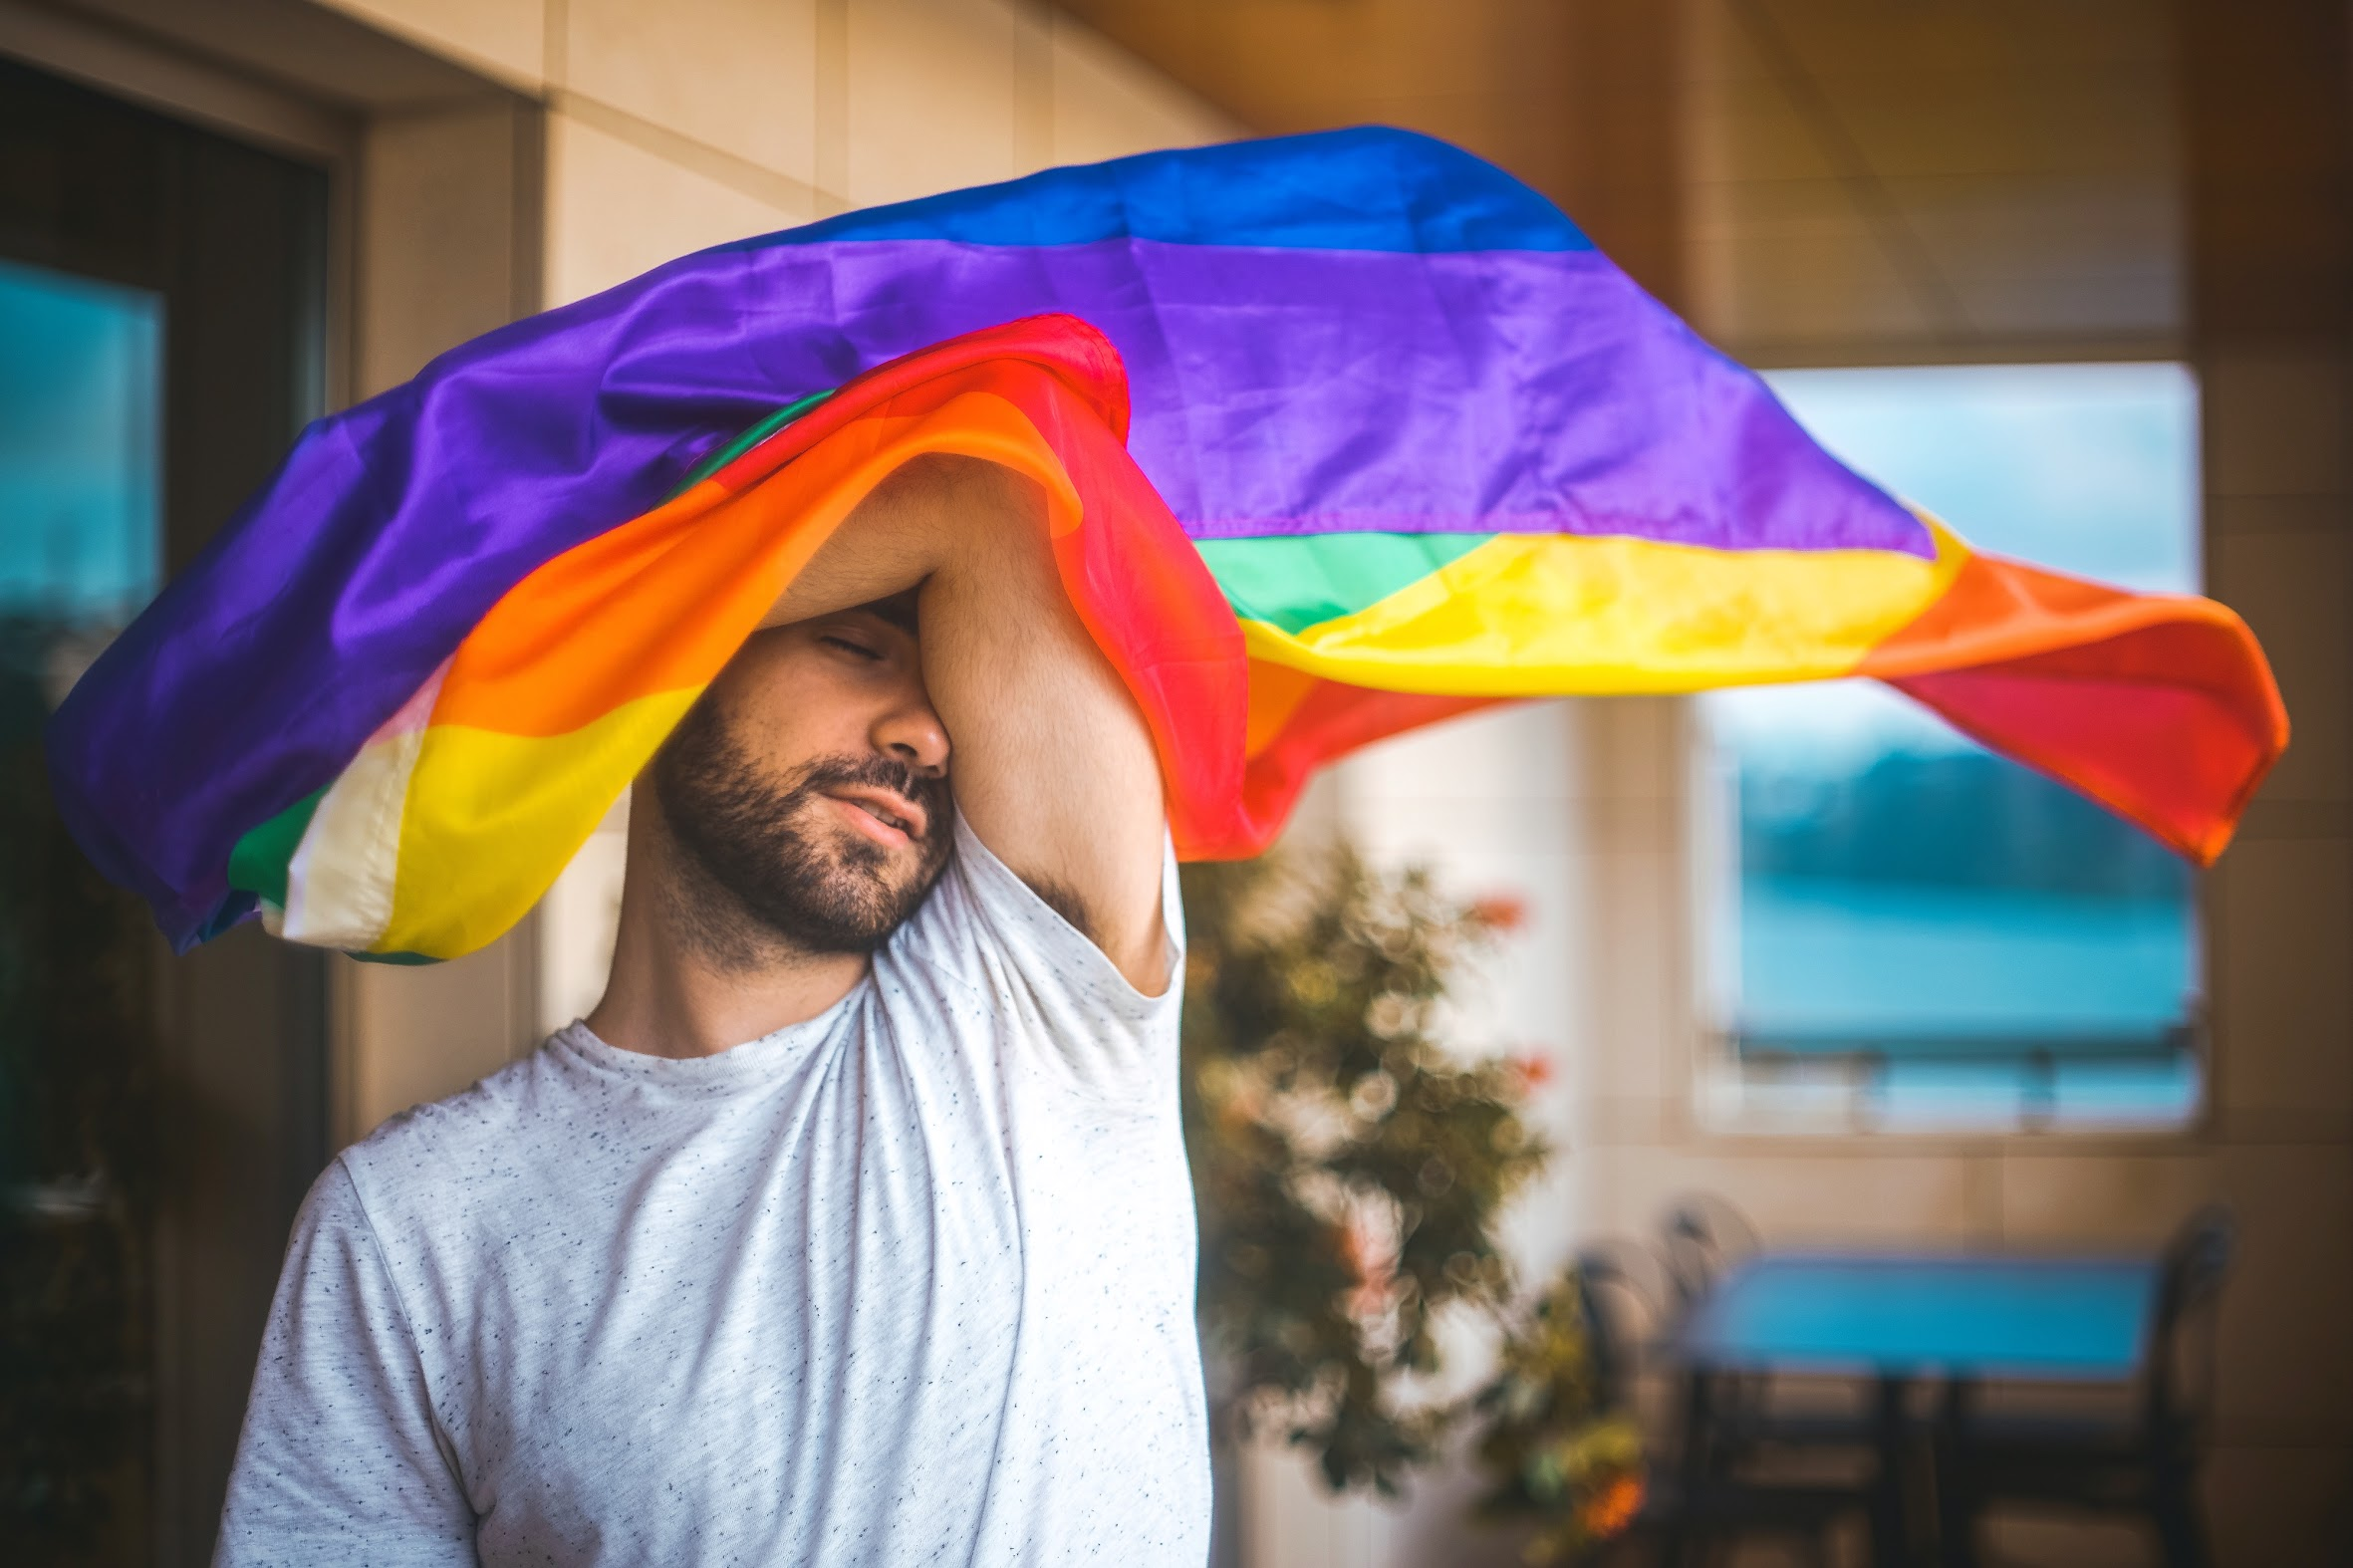 Tiago Braga Ilusão entrevista LGBTI Portugal Cultura Música Pop rainbow.JPG